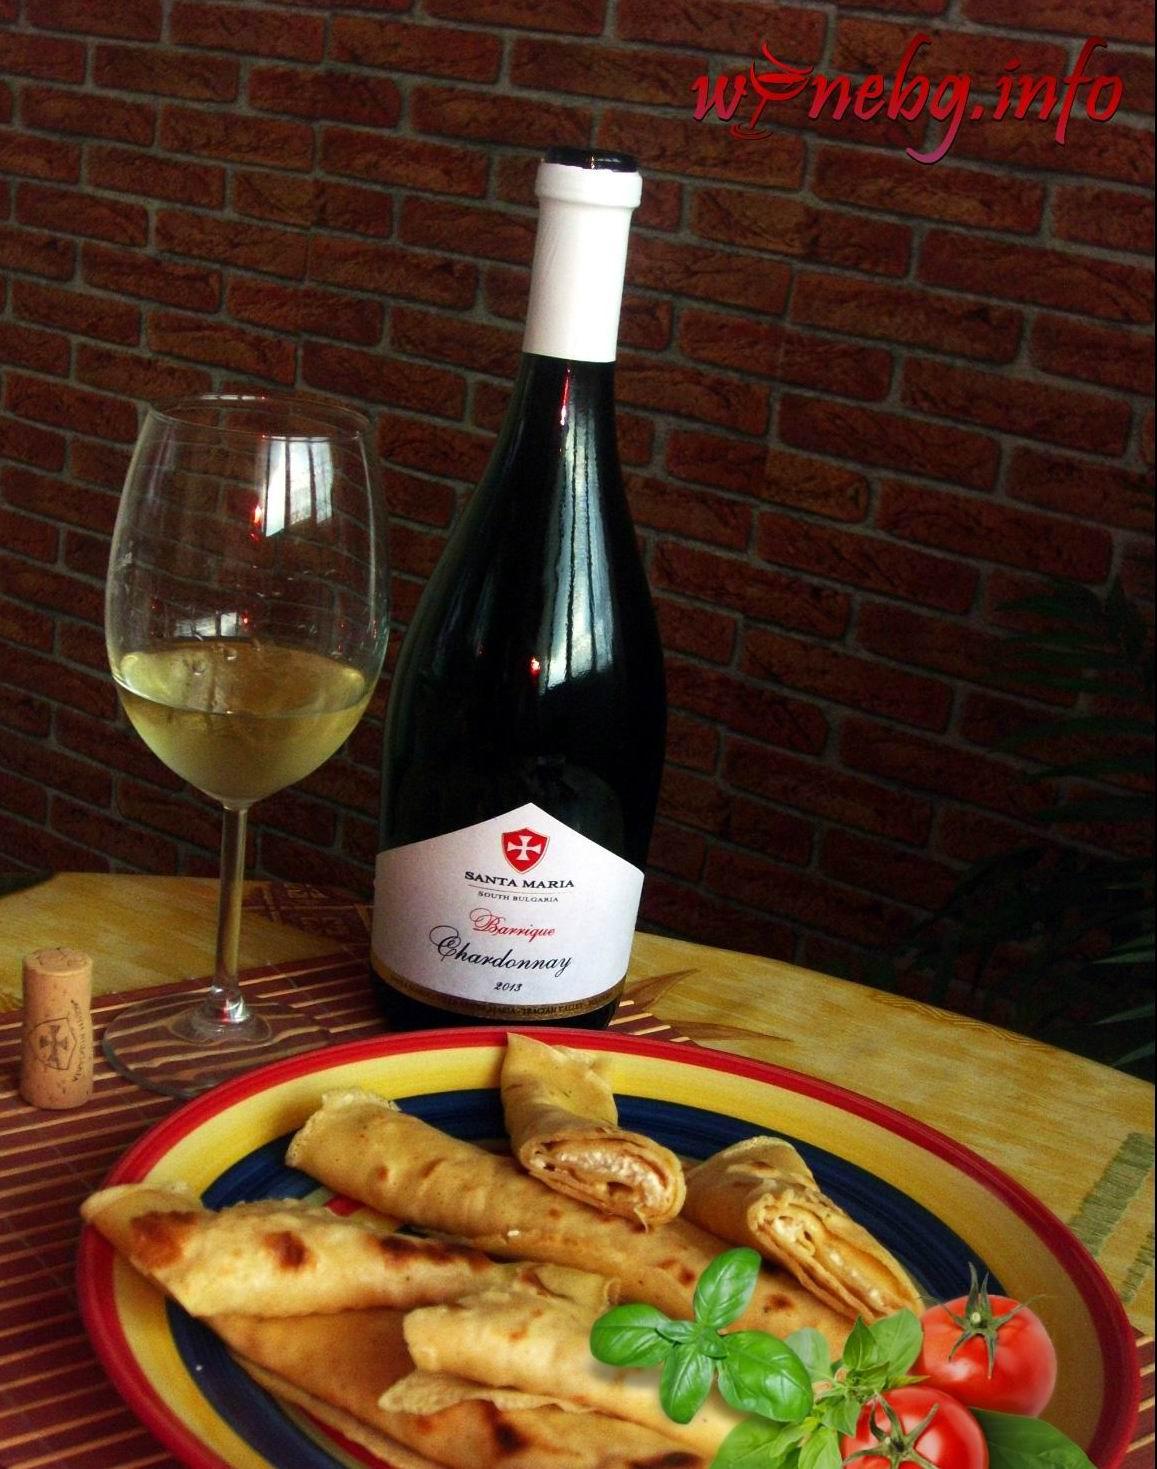 Chardonnay barrigue Santa Maria 2013